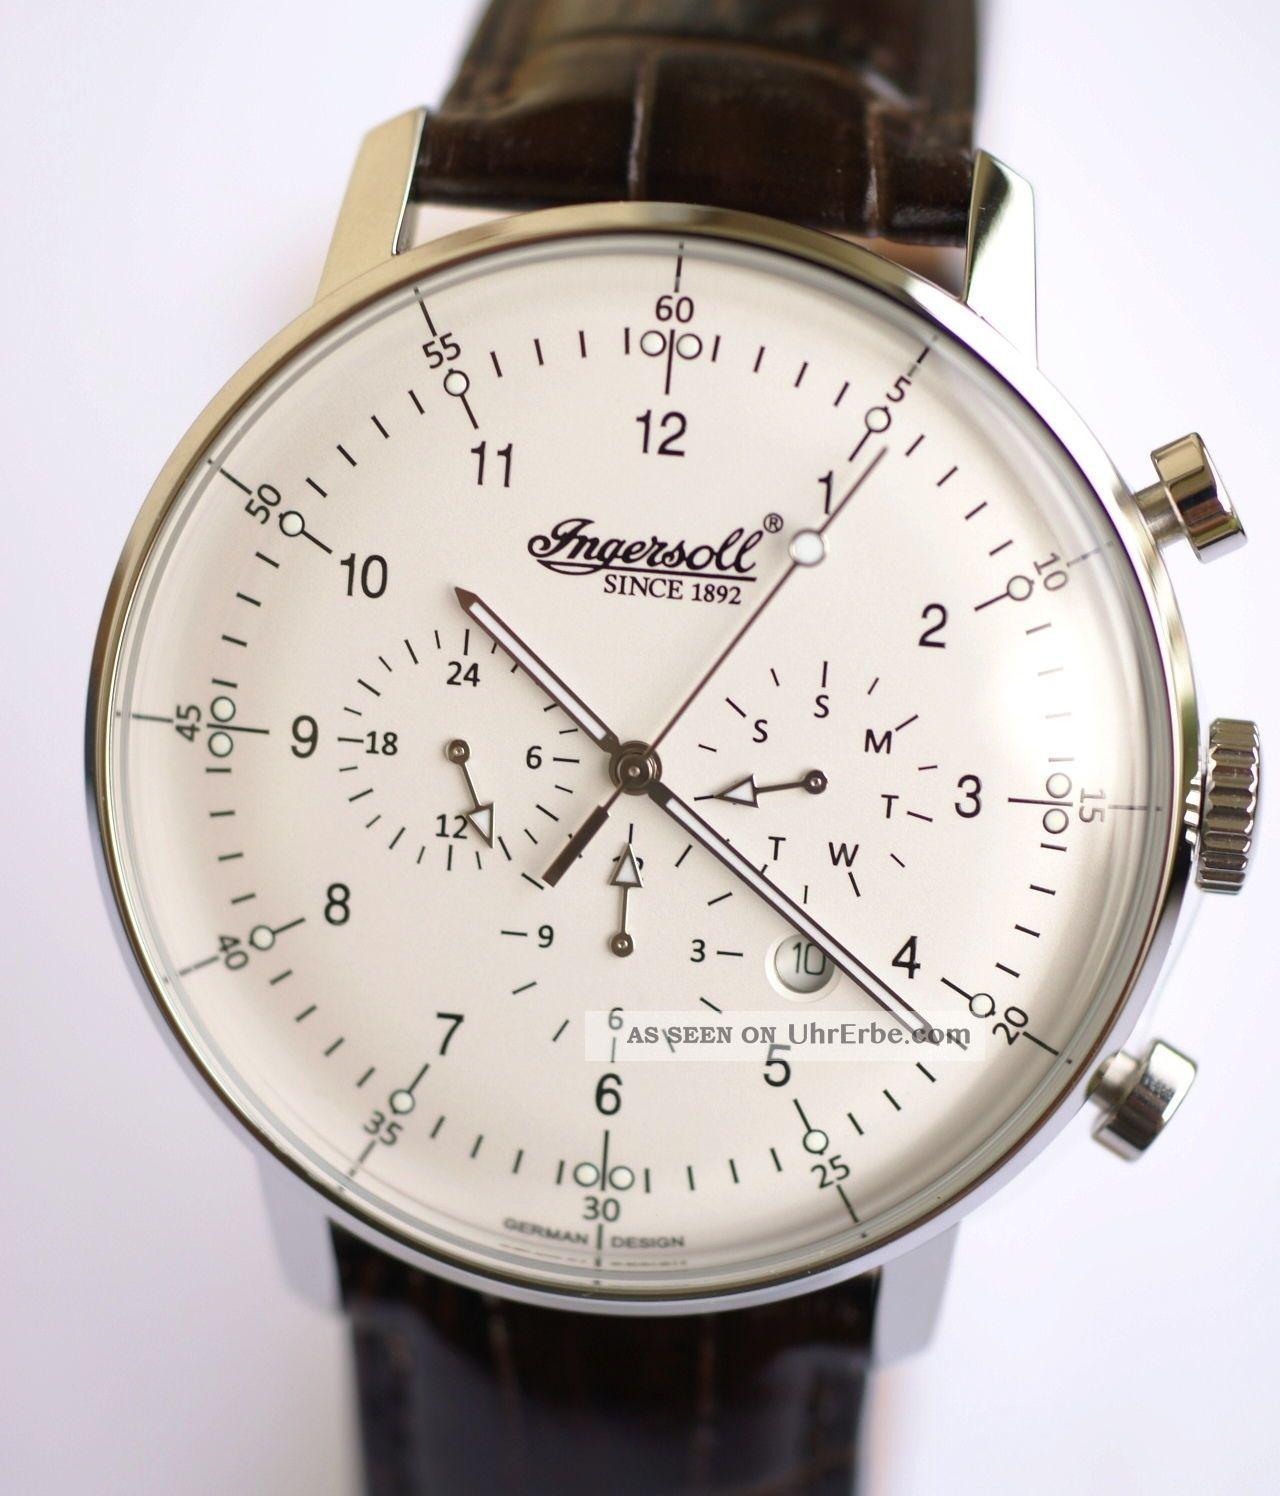 Ingersoll - Housten - Helles Ziffernblatt,  In2816wh Armbanduhren Bild